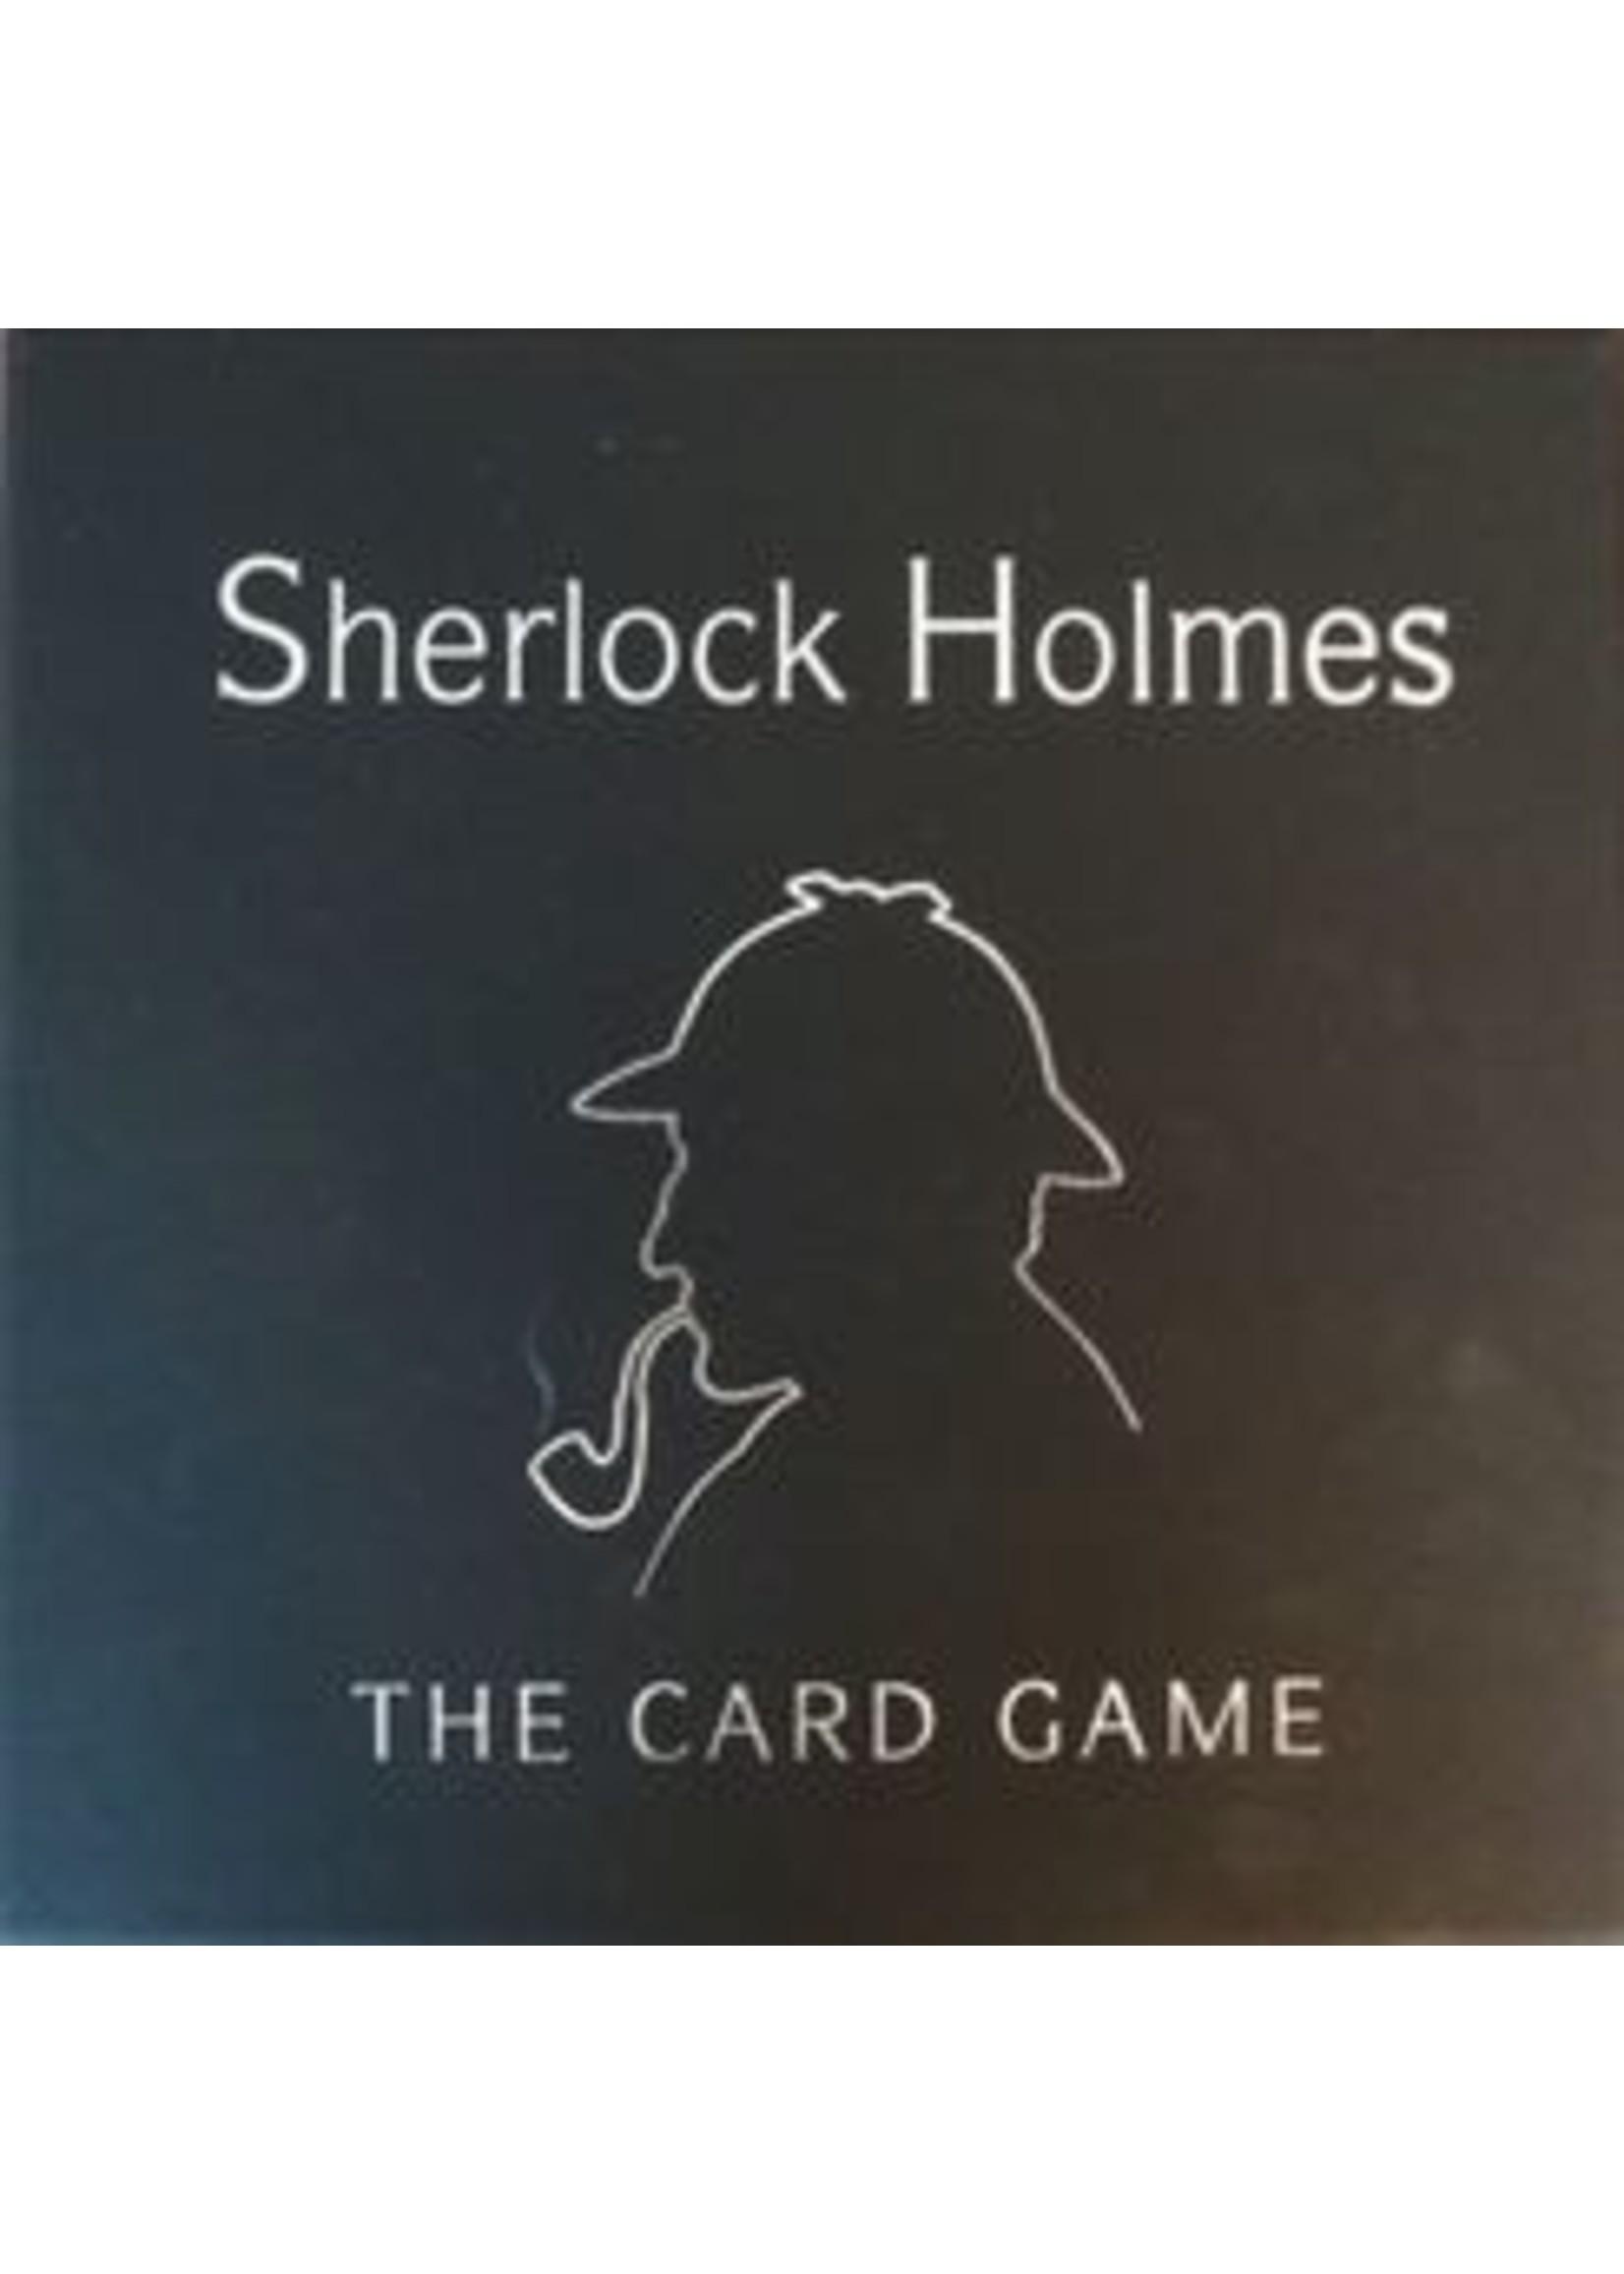 Sherlock Holmes The Card Game